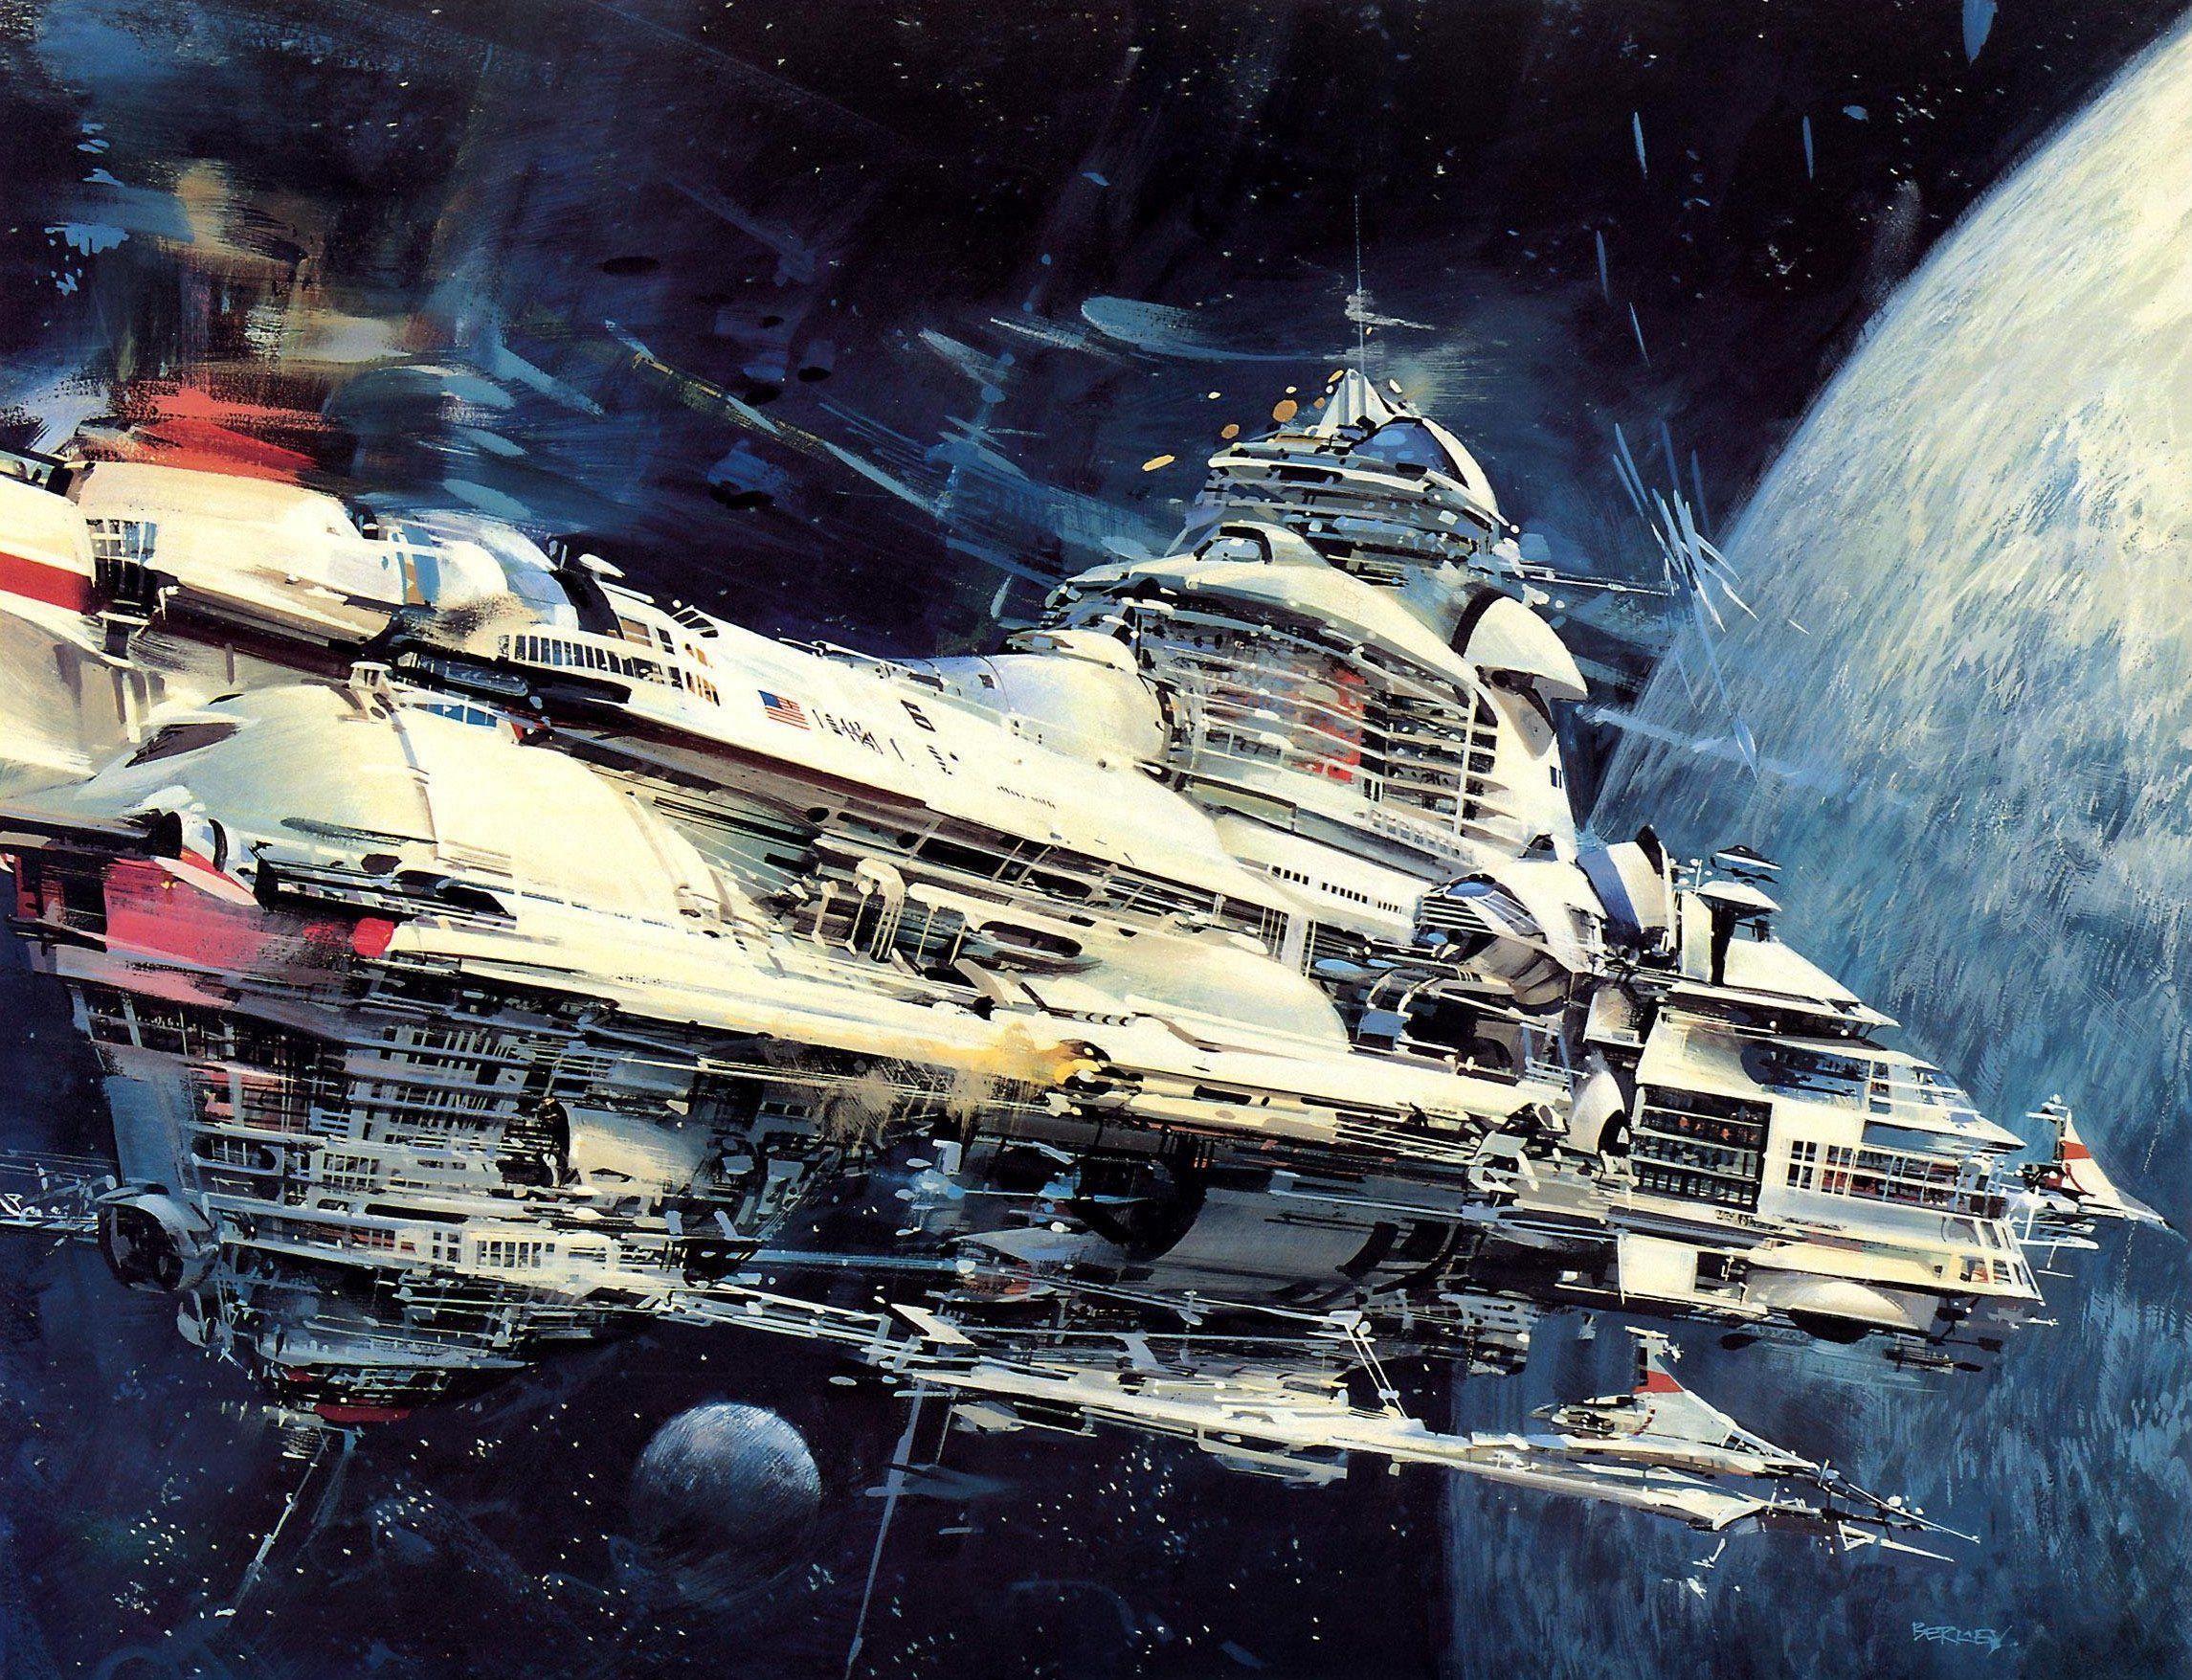 john berkey - colonies in space | Fantasy & Sci-Fi Art ...